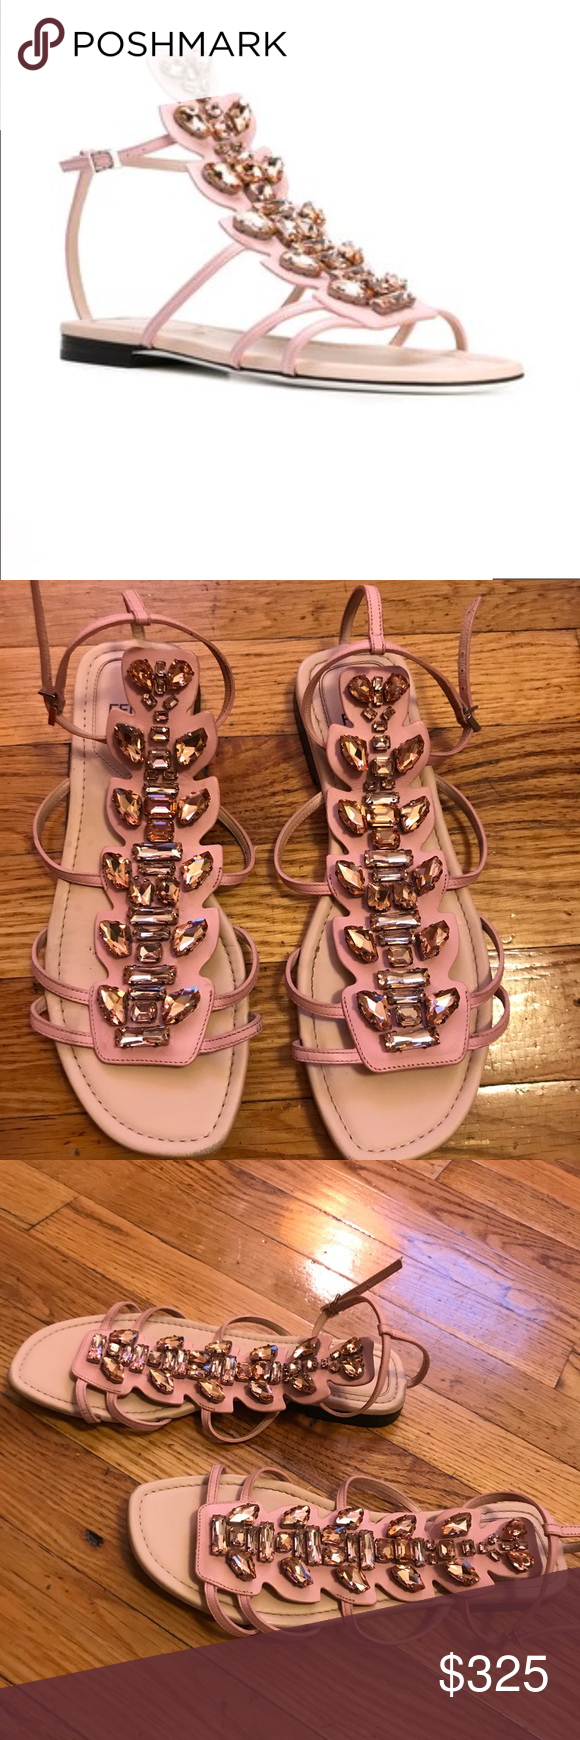 c5dcdc72f01c7 FENDI Crystal Embellished Flat Sandals Pink calf leather crystal  embellished flat sandals from Fendi featuring an